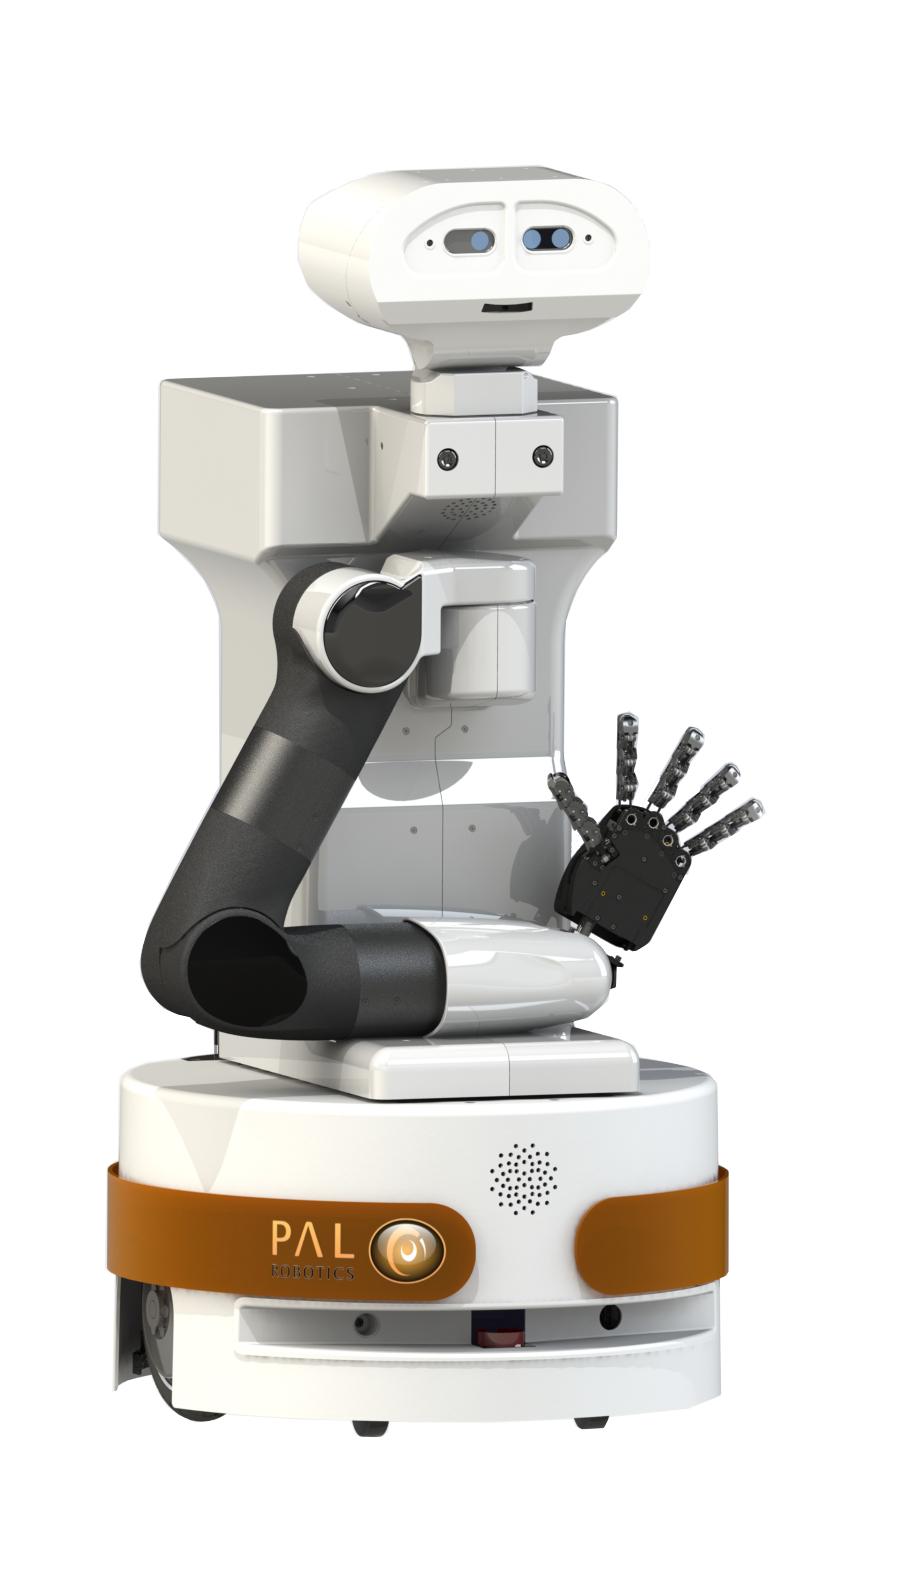 Robot for research. TIAGo Titanium version